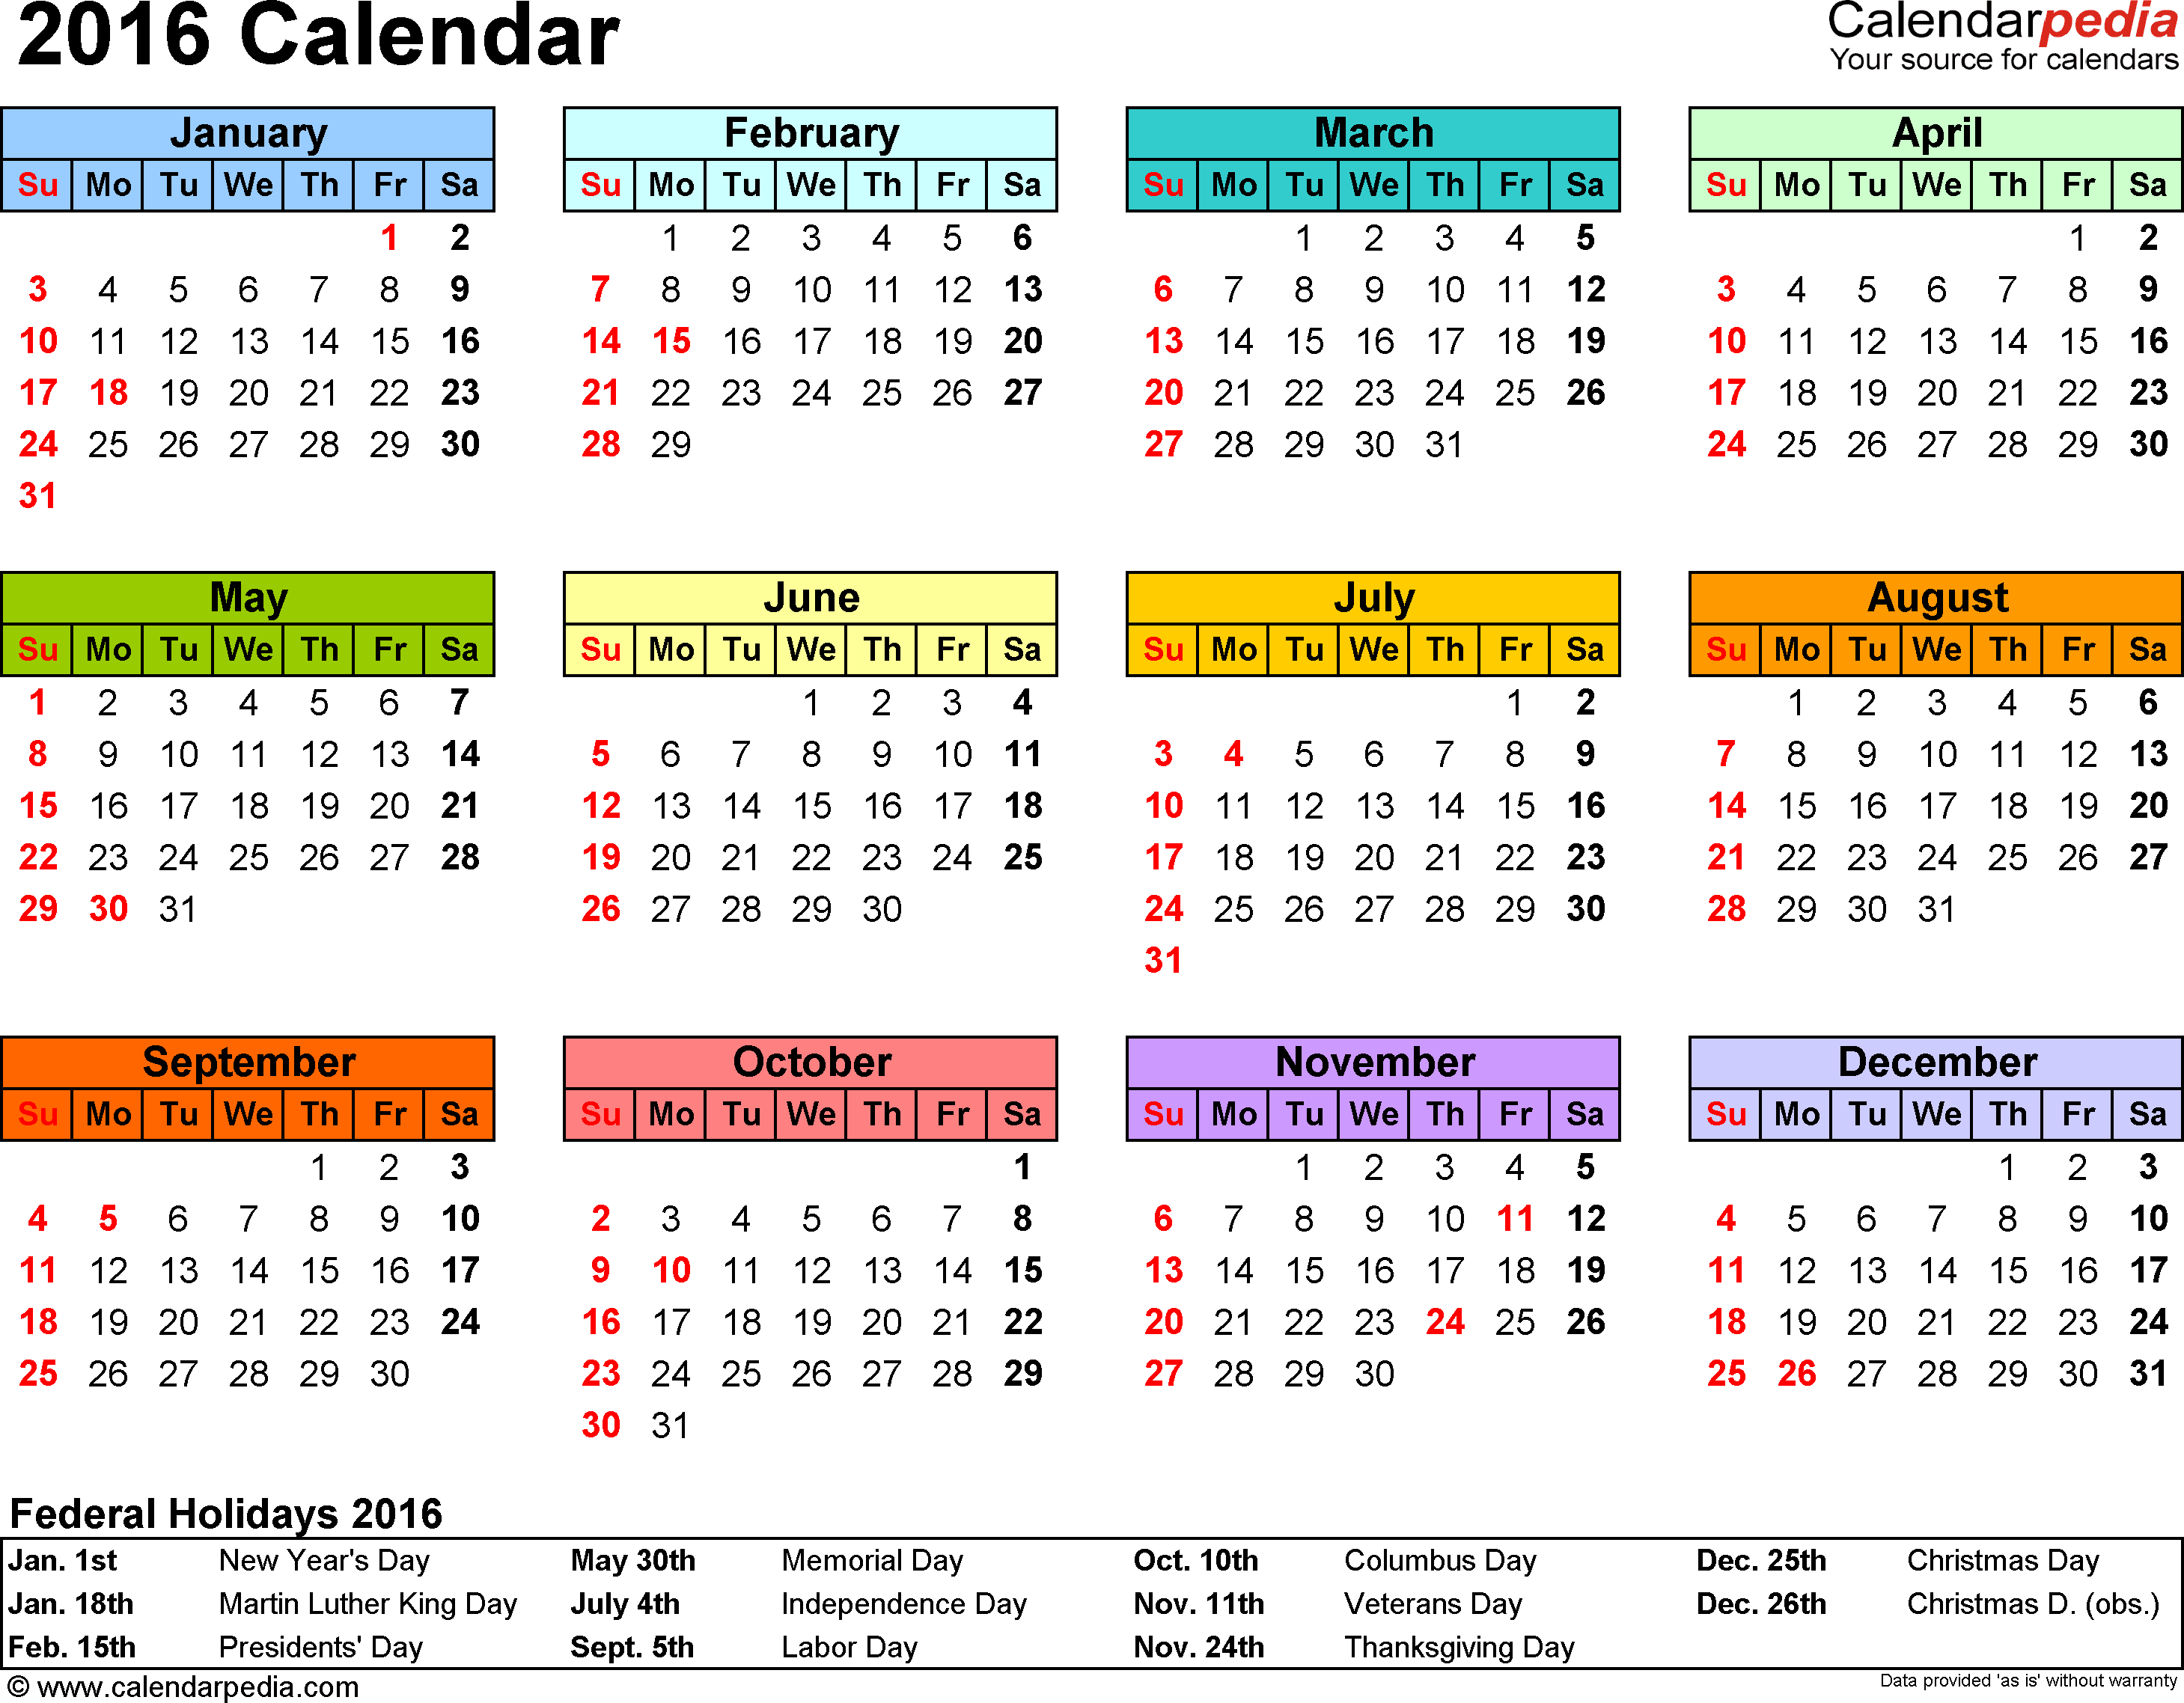 2016 Calendar Pdf 16 Free Printable Calendar Templates For Pdf Calendar Printables Printable Calendar 2016 Calendar Template